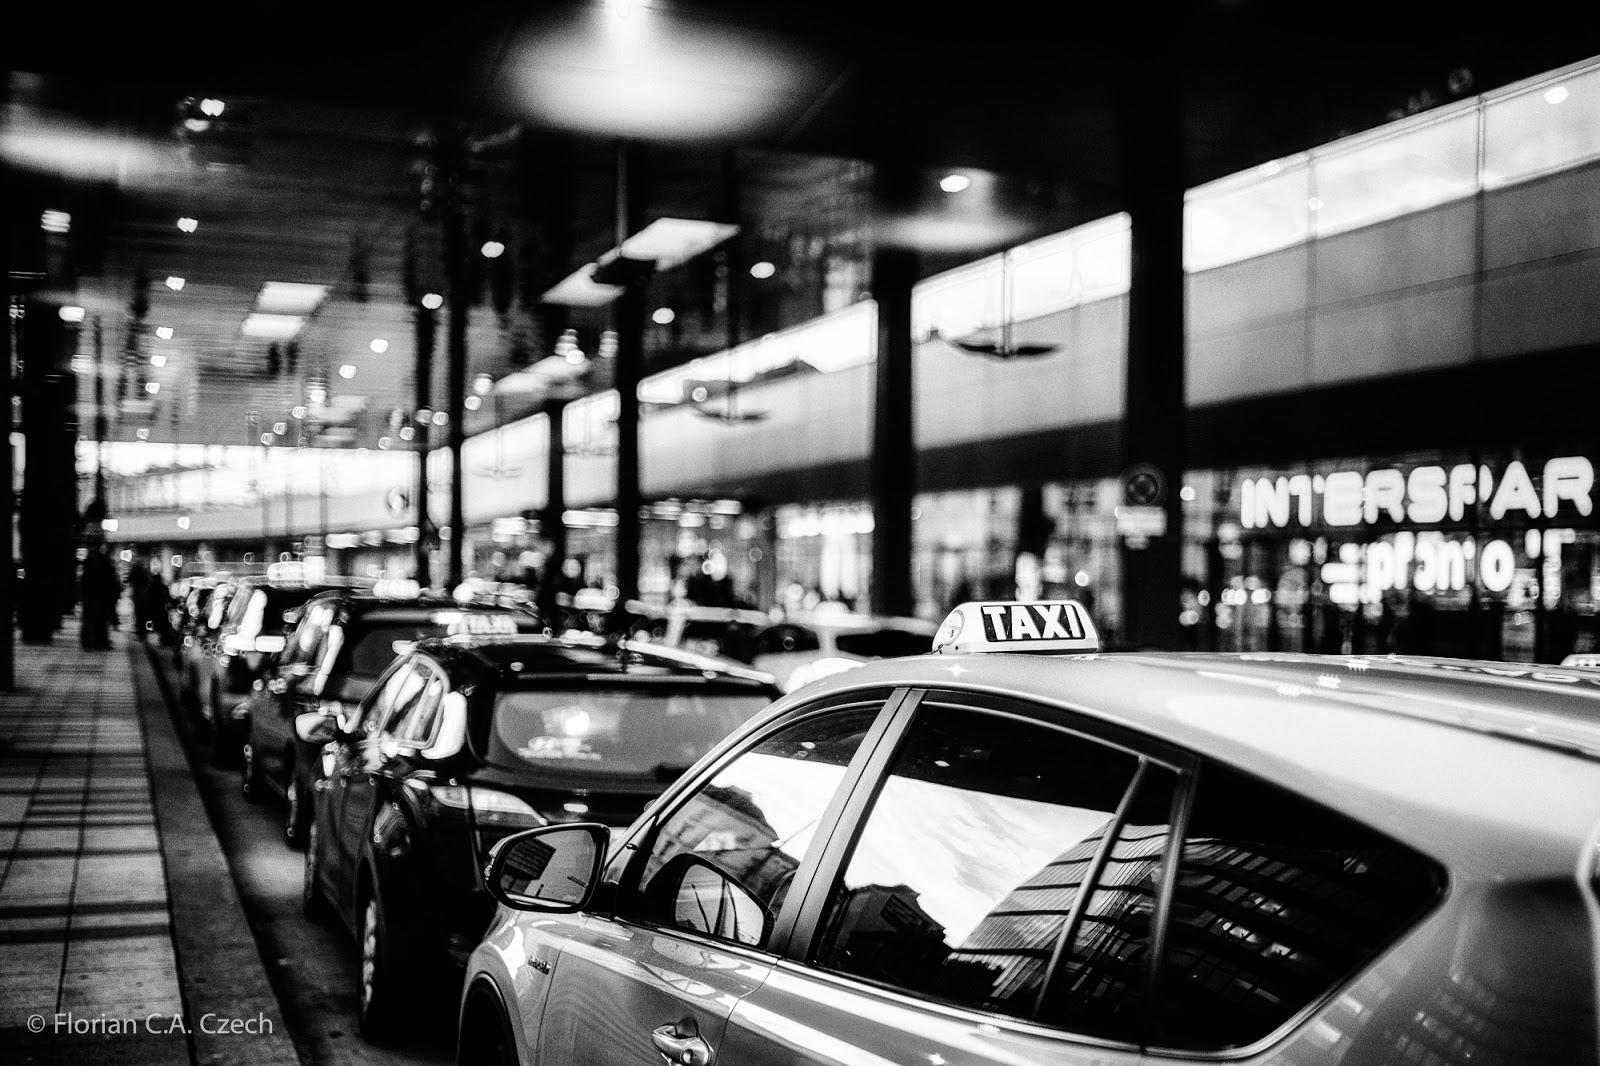 Taxi schwarz weiss